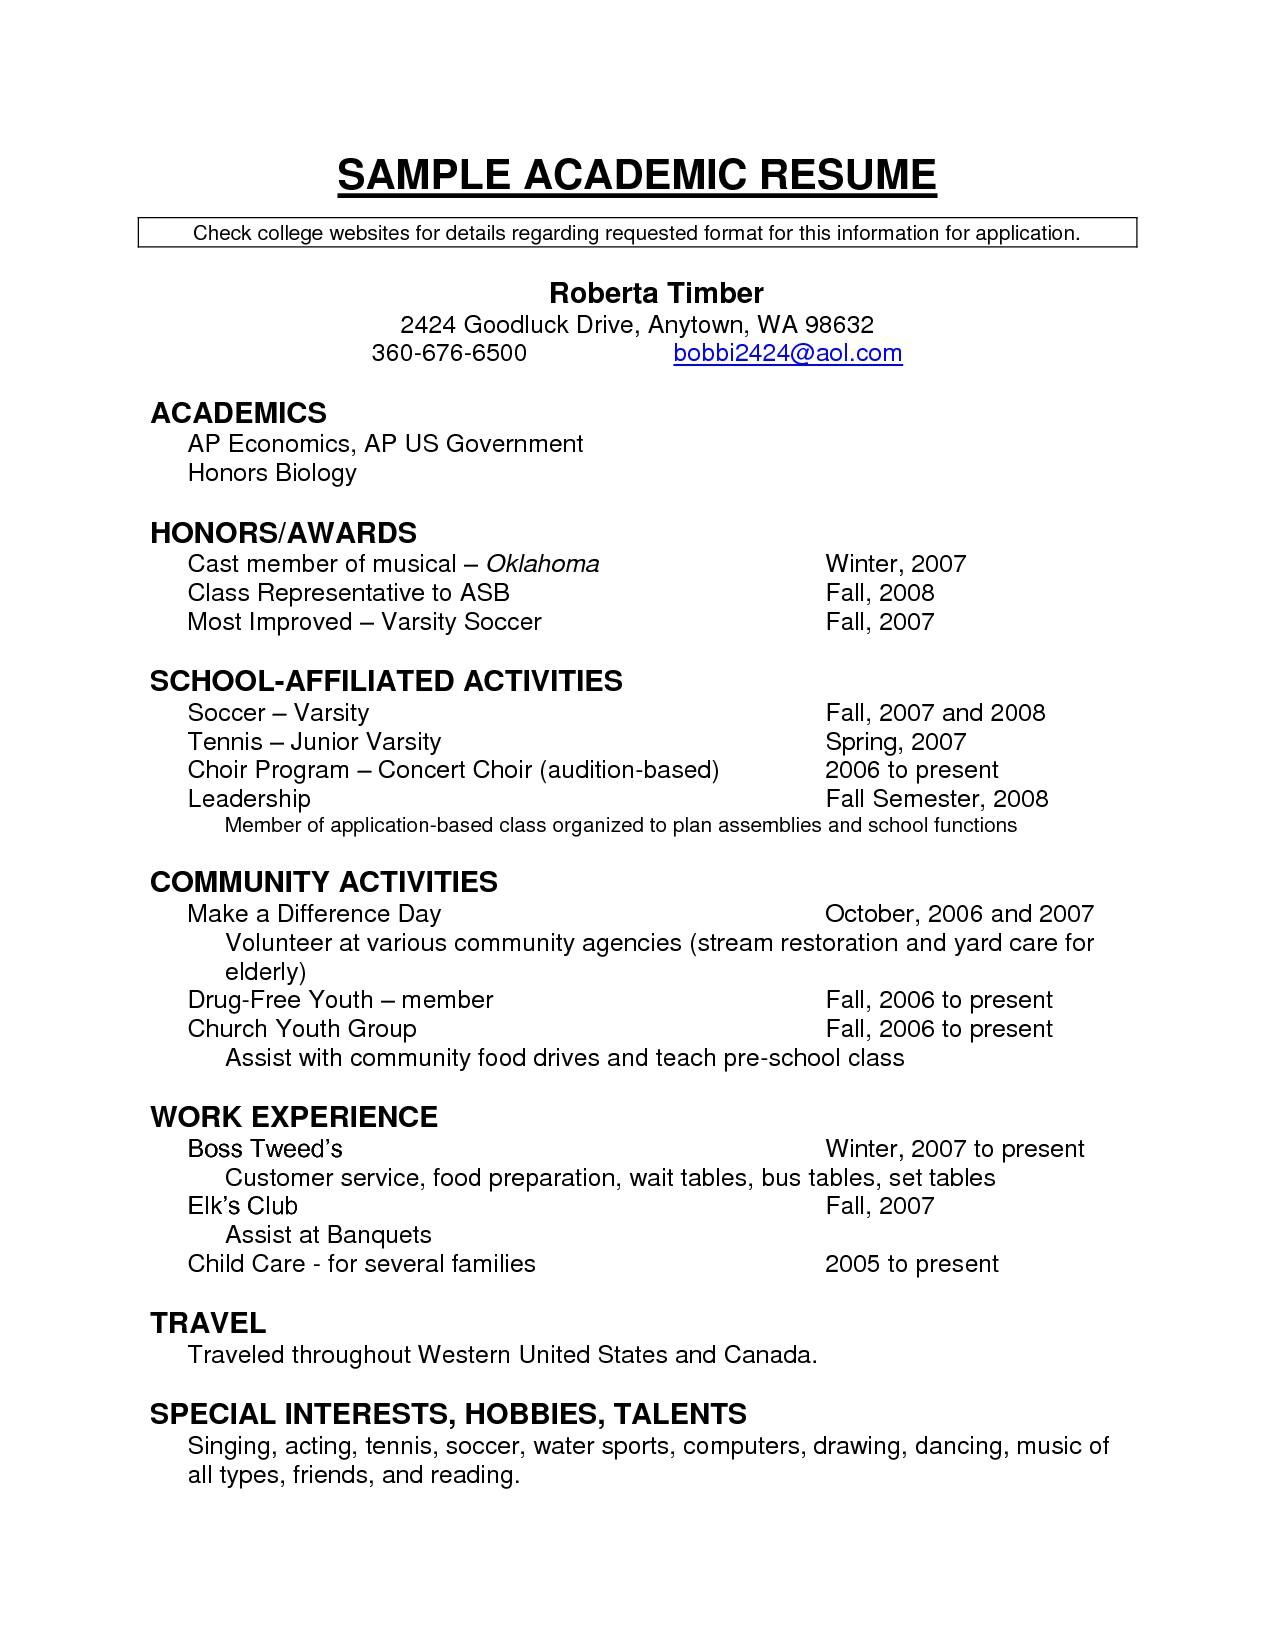 academic resume template